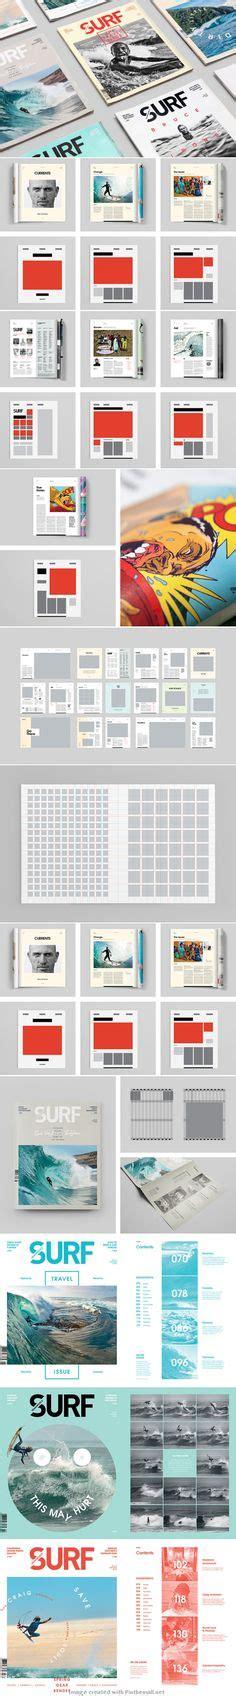 magazine layout my designs pinterest 1 quot layout and 1000 ideas about magazine layouts on pinterest layout